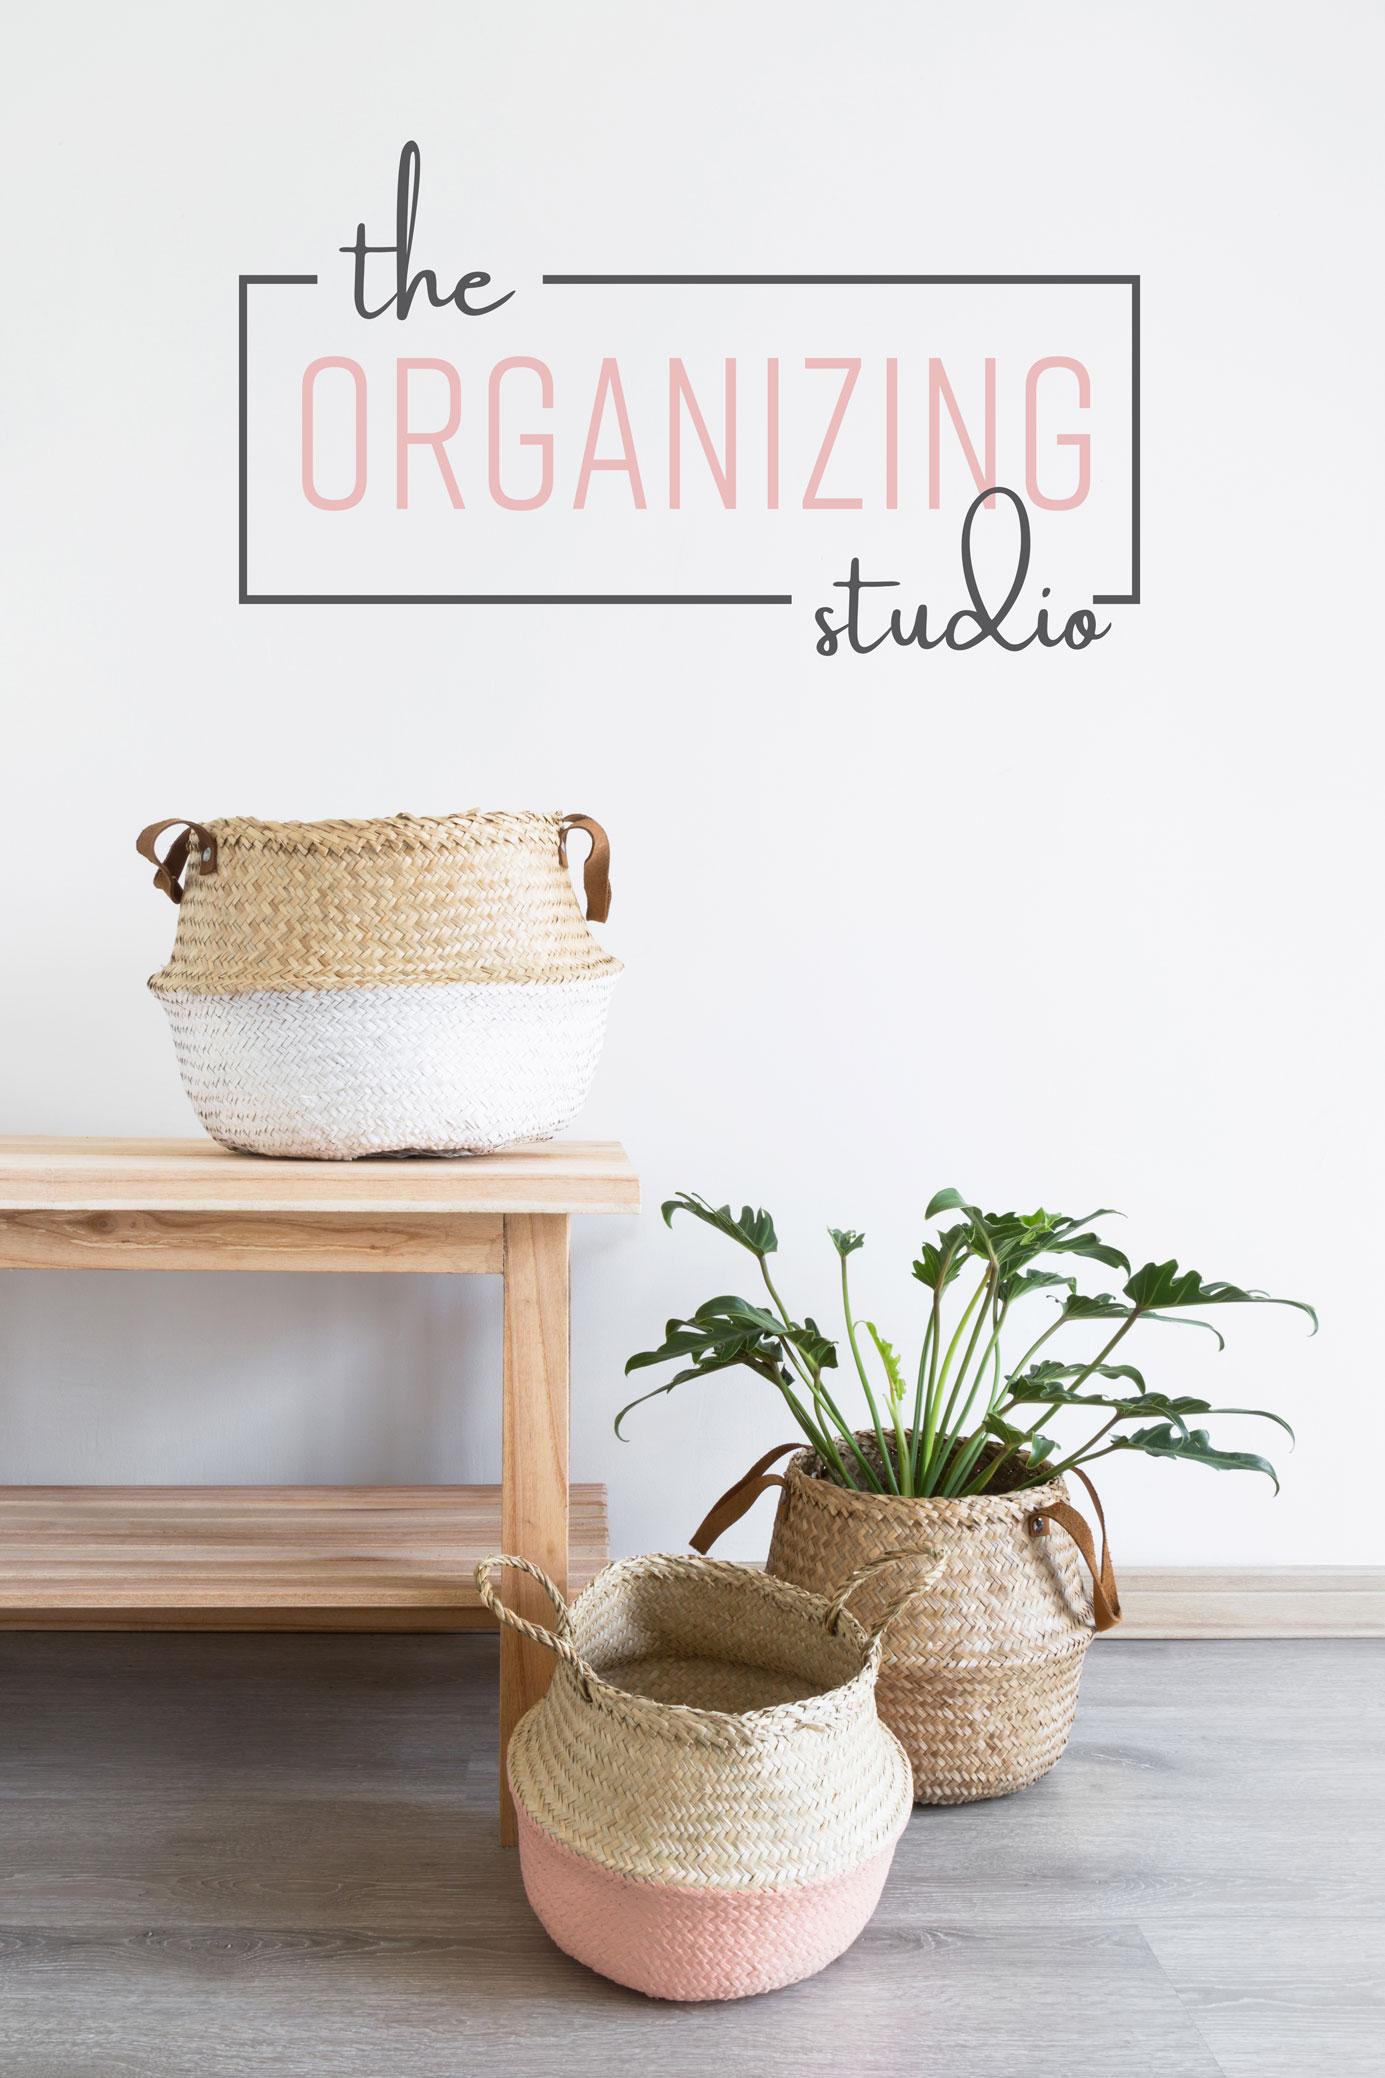 professional_organizer.jpg